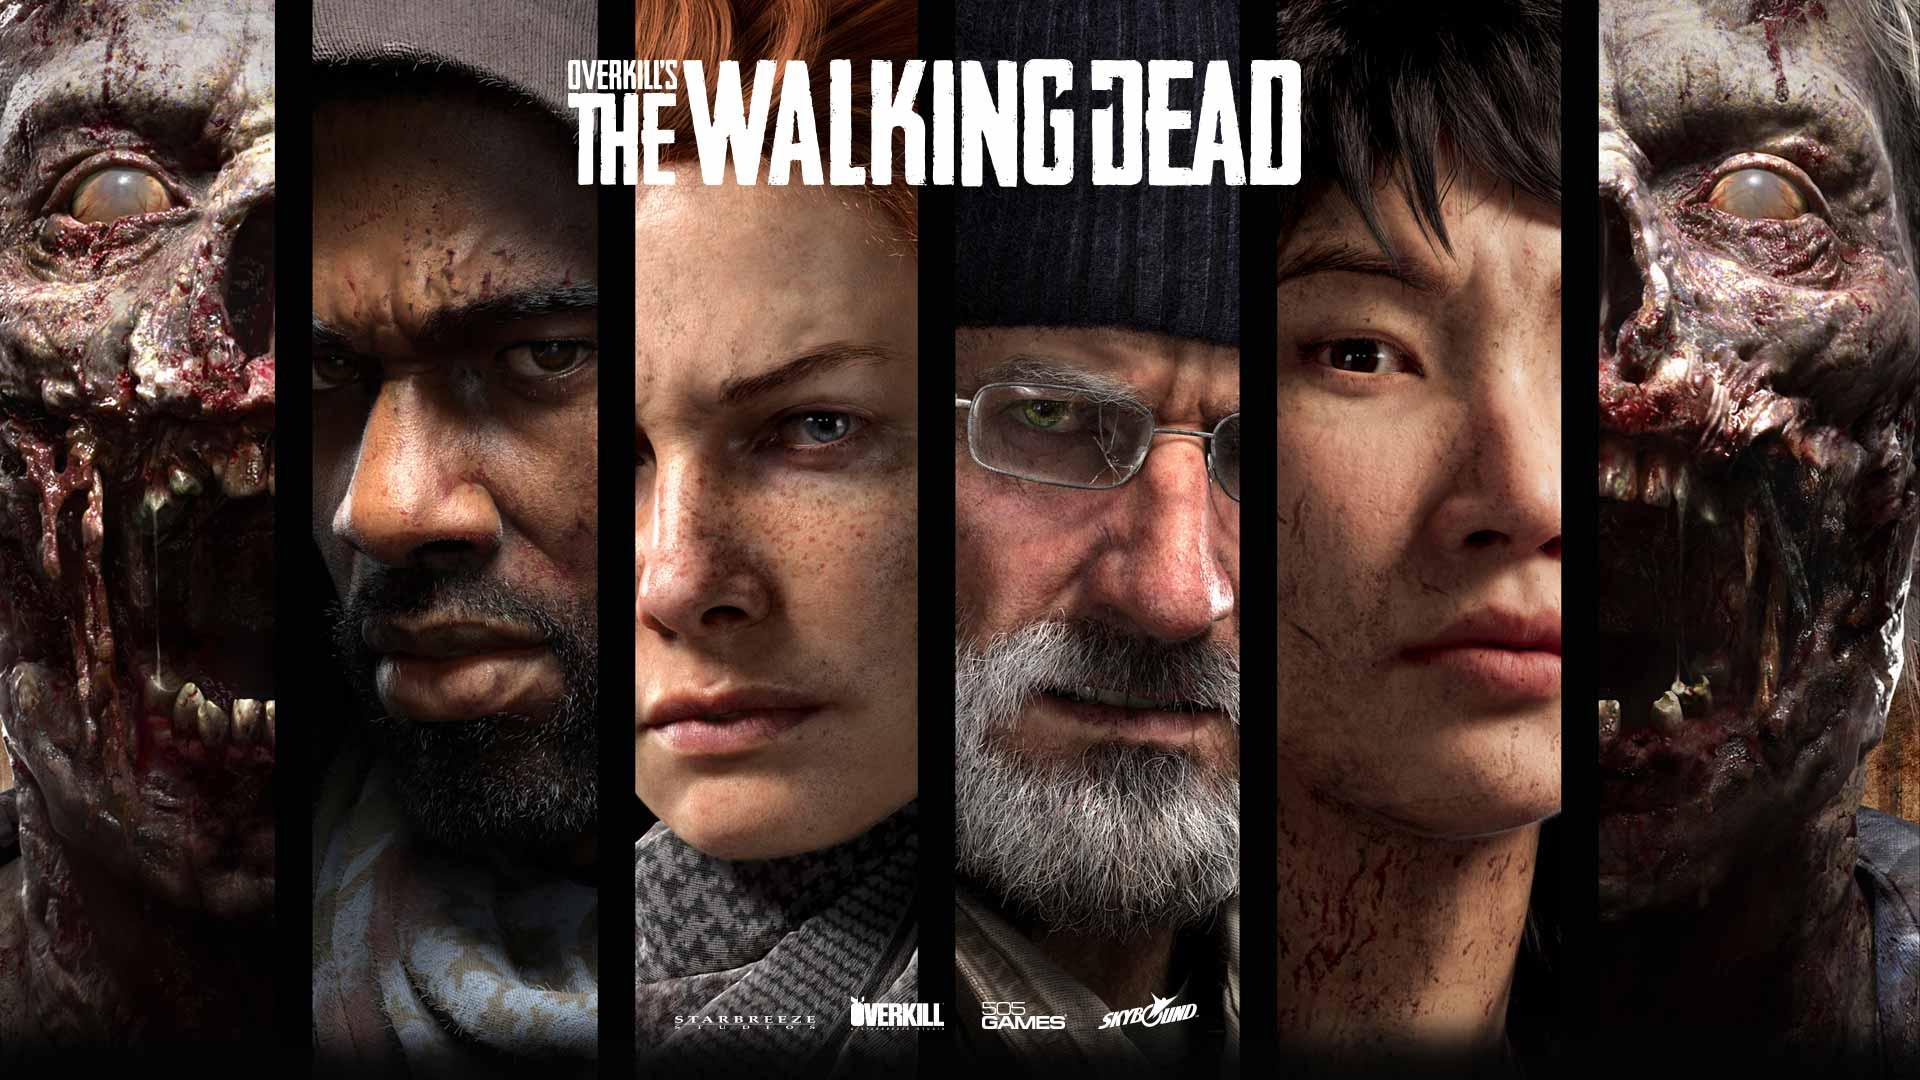 Overkill's The Walking Dead enters beta!